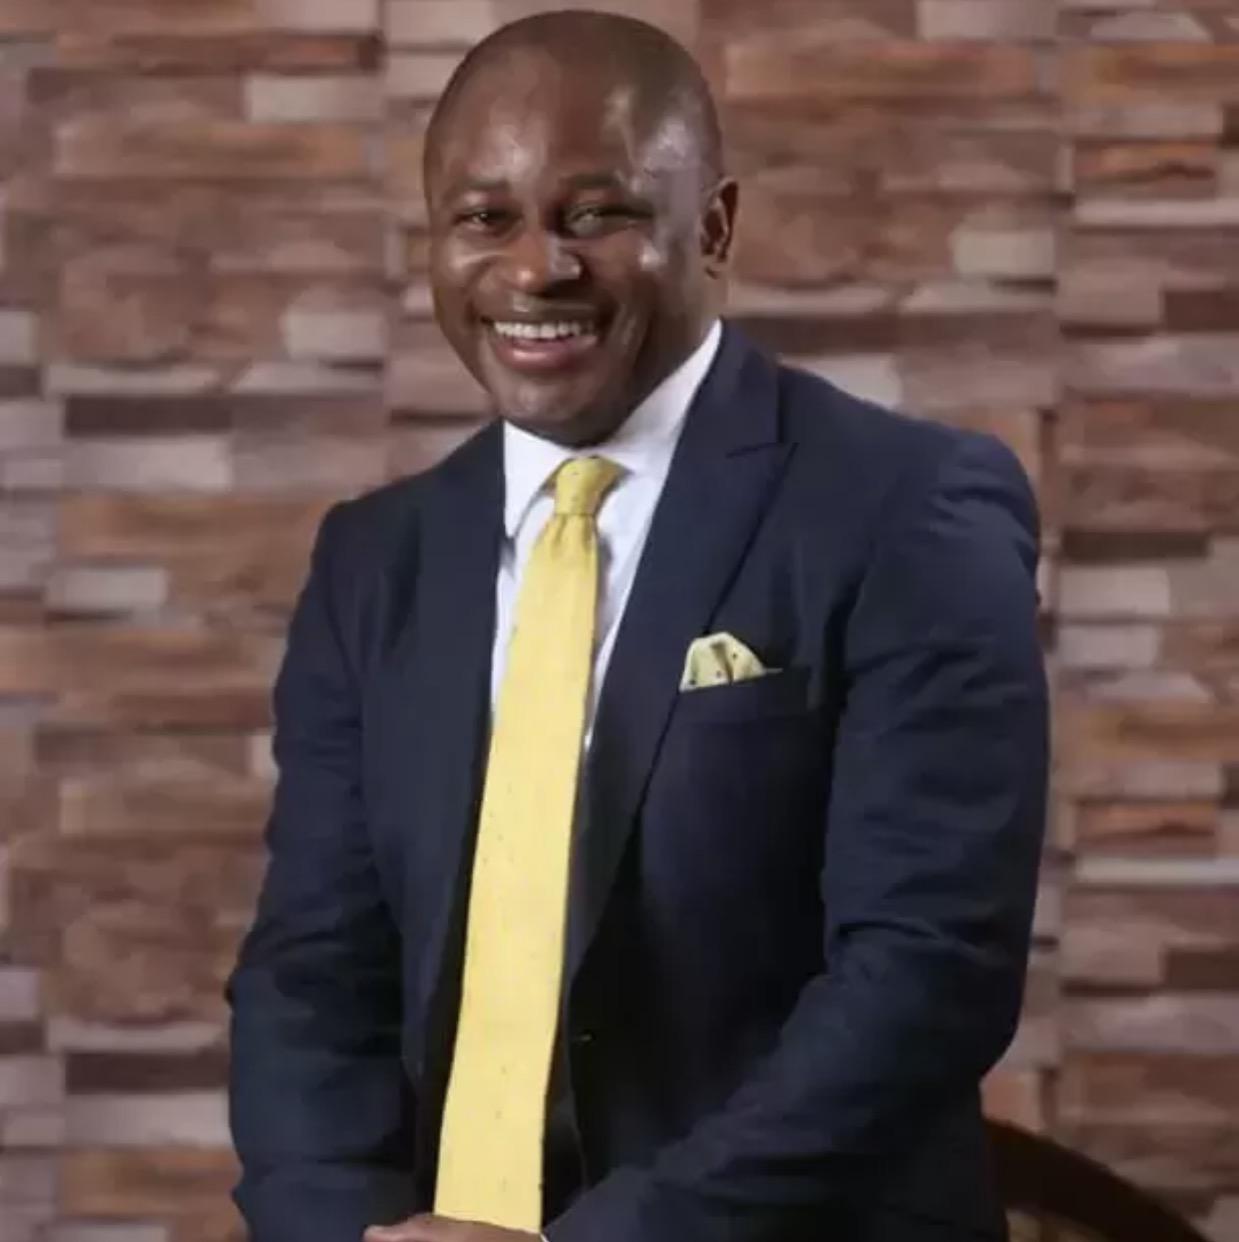 Happy Birthday Esteemed Pastor Sir!